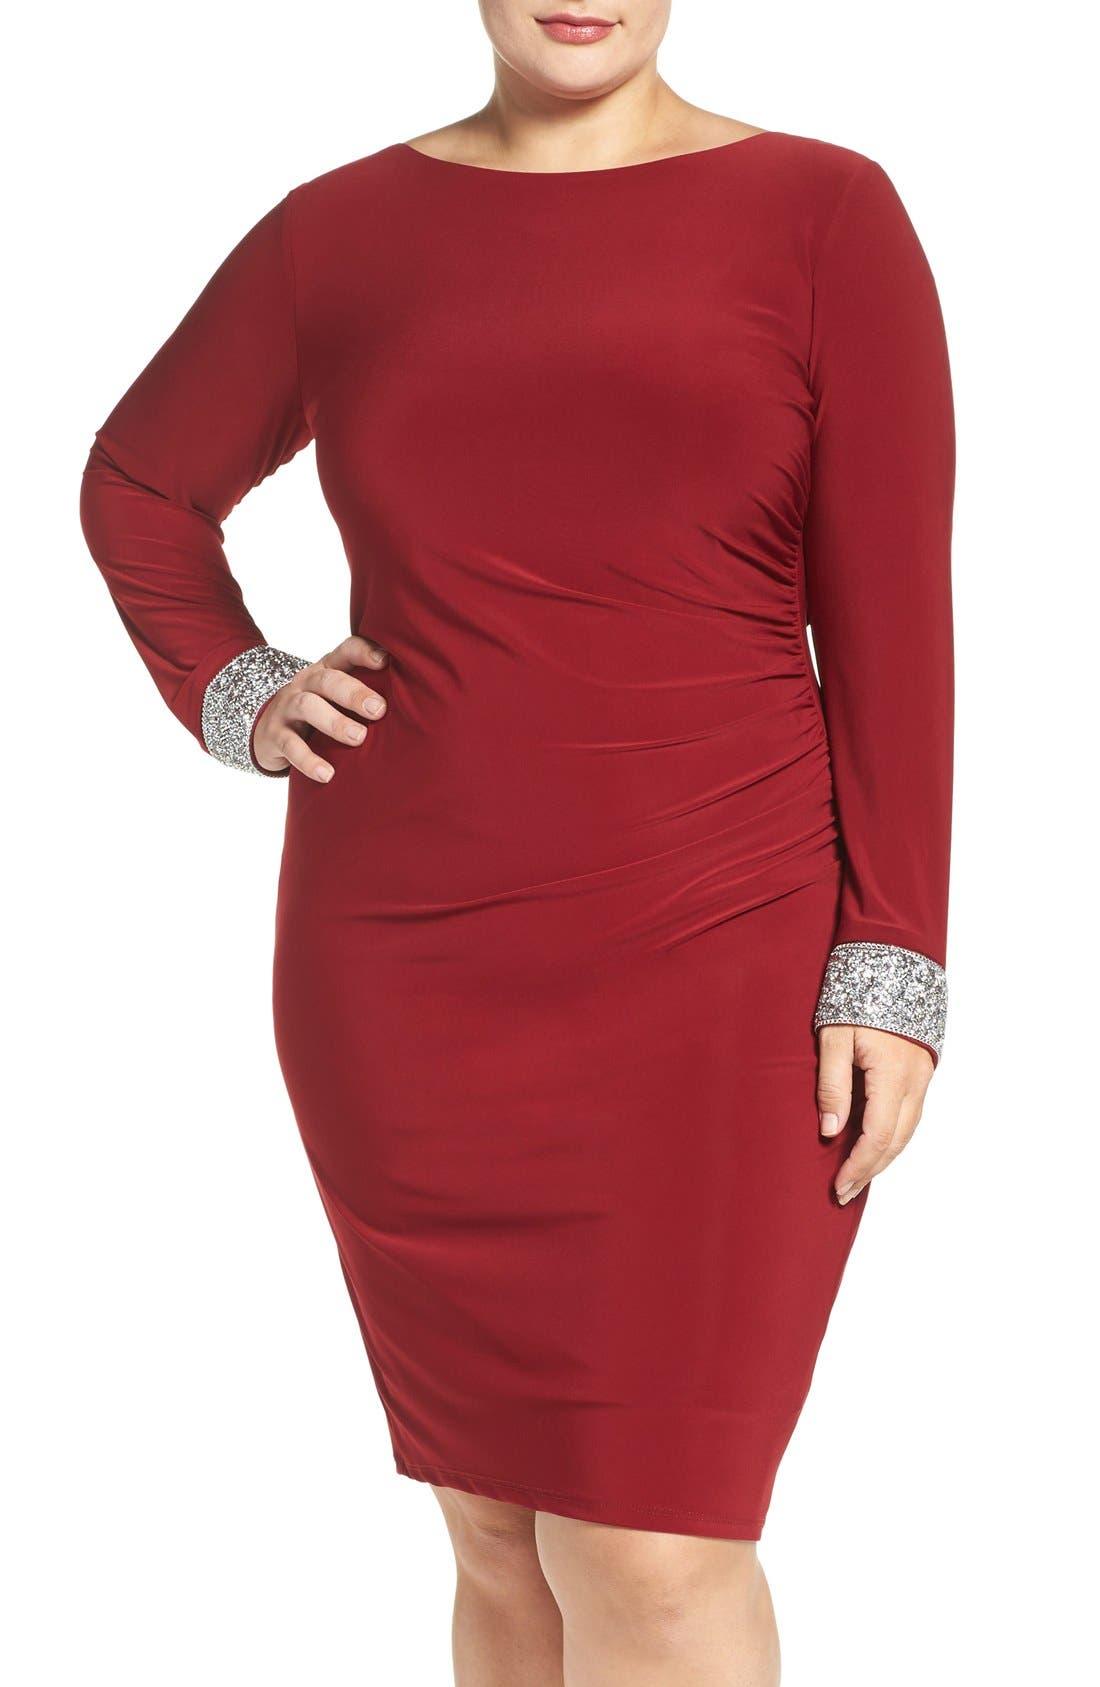 Alternate Image 1 Selected - Marina Embellished Drape Back Jersey Cocktail Dress (Plus Size)